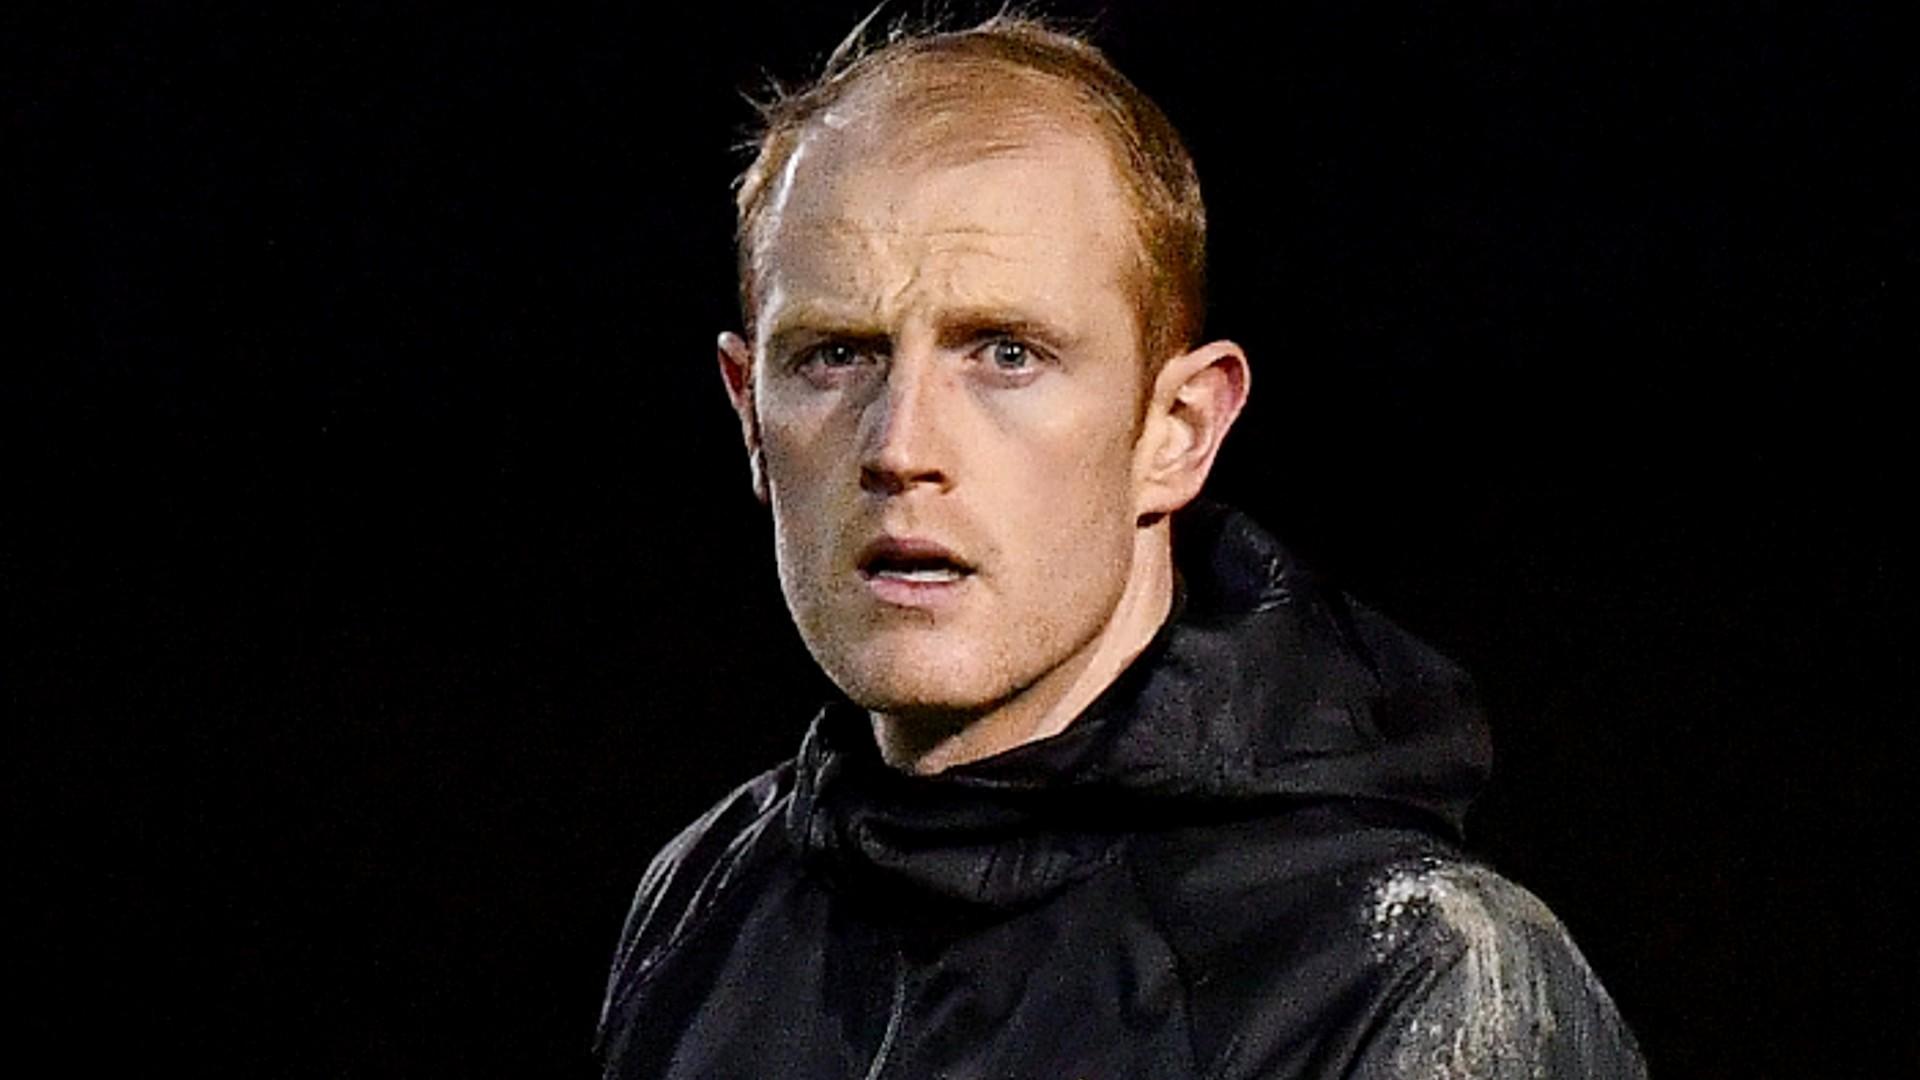 Fight between Glentoran teammates in Northern Ireland results in red card